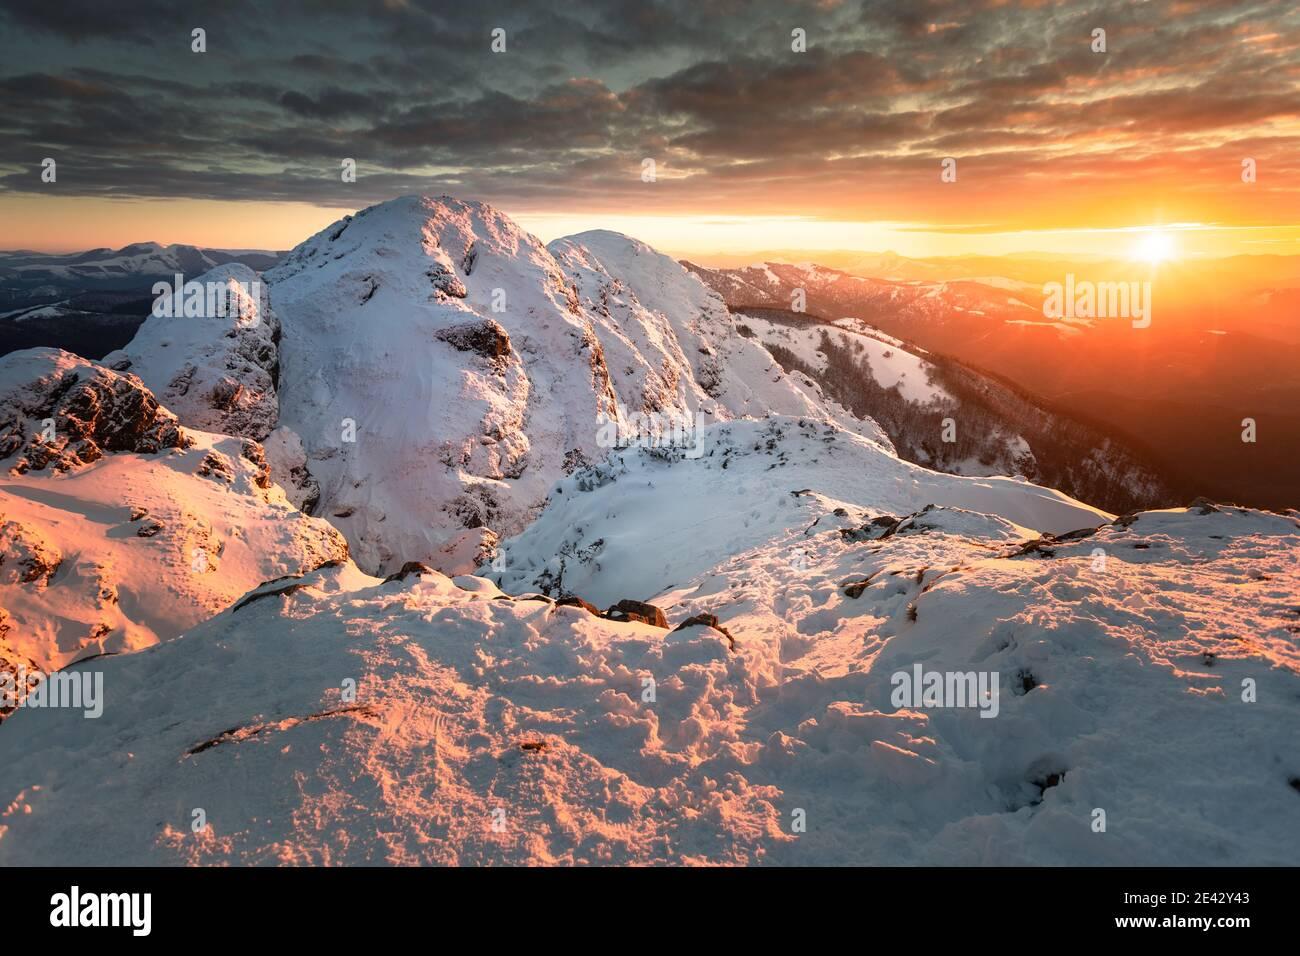 Vista nevada desde la cima de la montaña Aiako Harriak en el país Vasco. Foto de stock